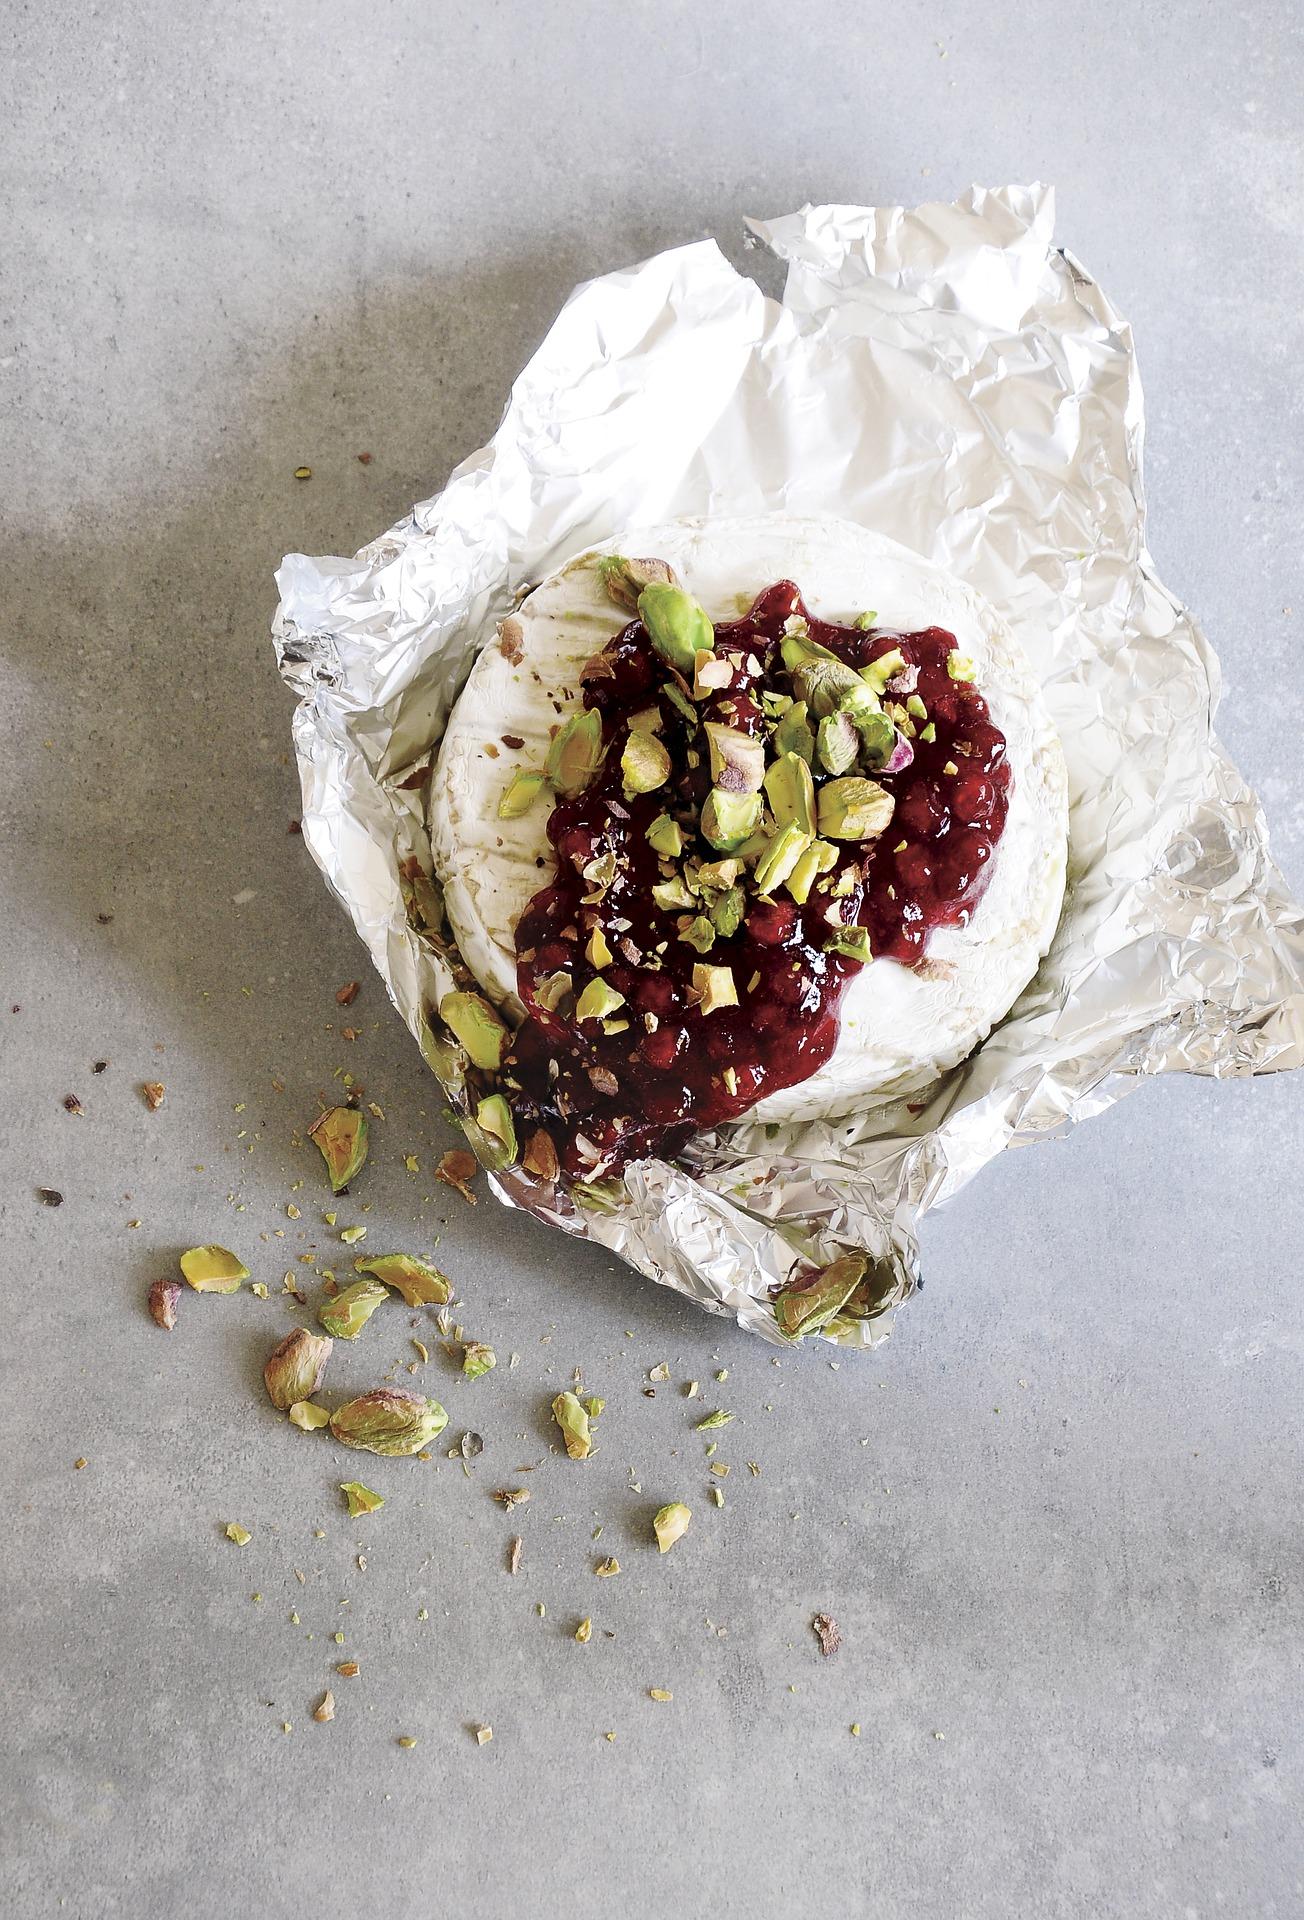 Camembert with Fig Jam and Pistachios Beggars Purse via @mermaidsandmojitos